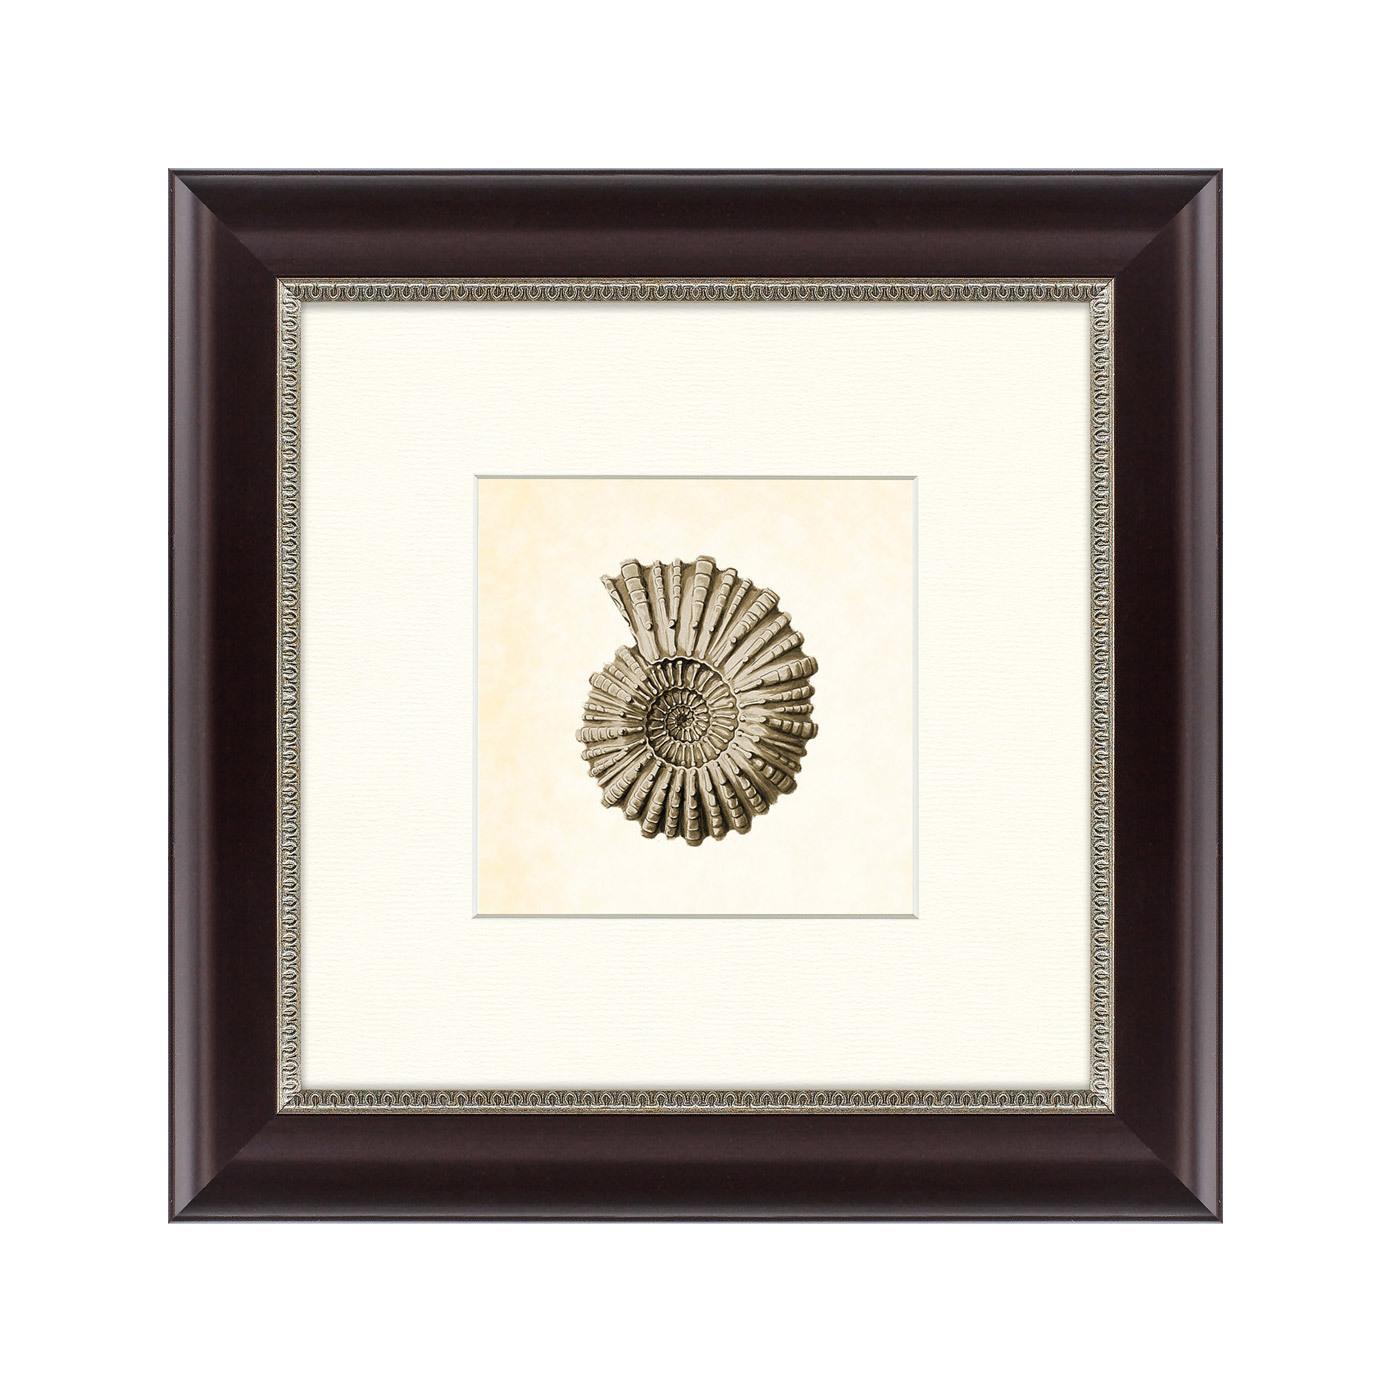 {} Картины в Квартиру Картина Морской Обитатель №3 (35х35 см) картины в квартиру картина etude 3 102х130 см